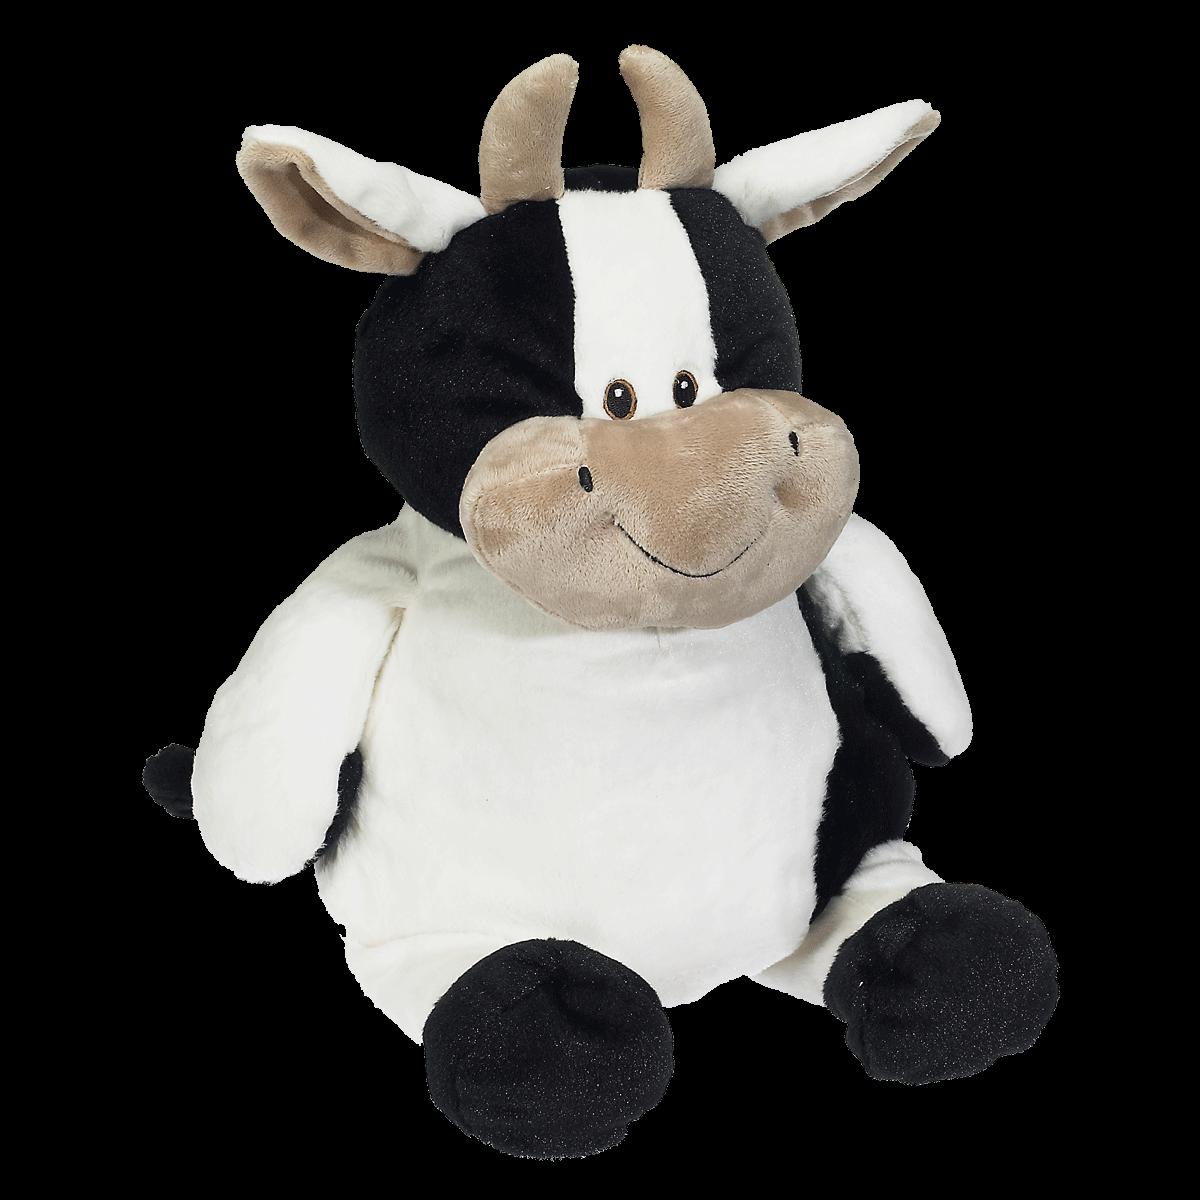 Moo Moo Cow Buddy